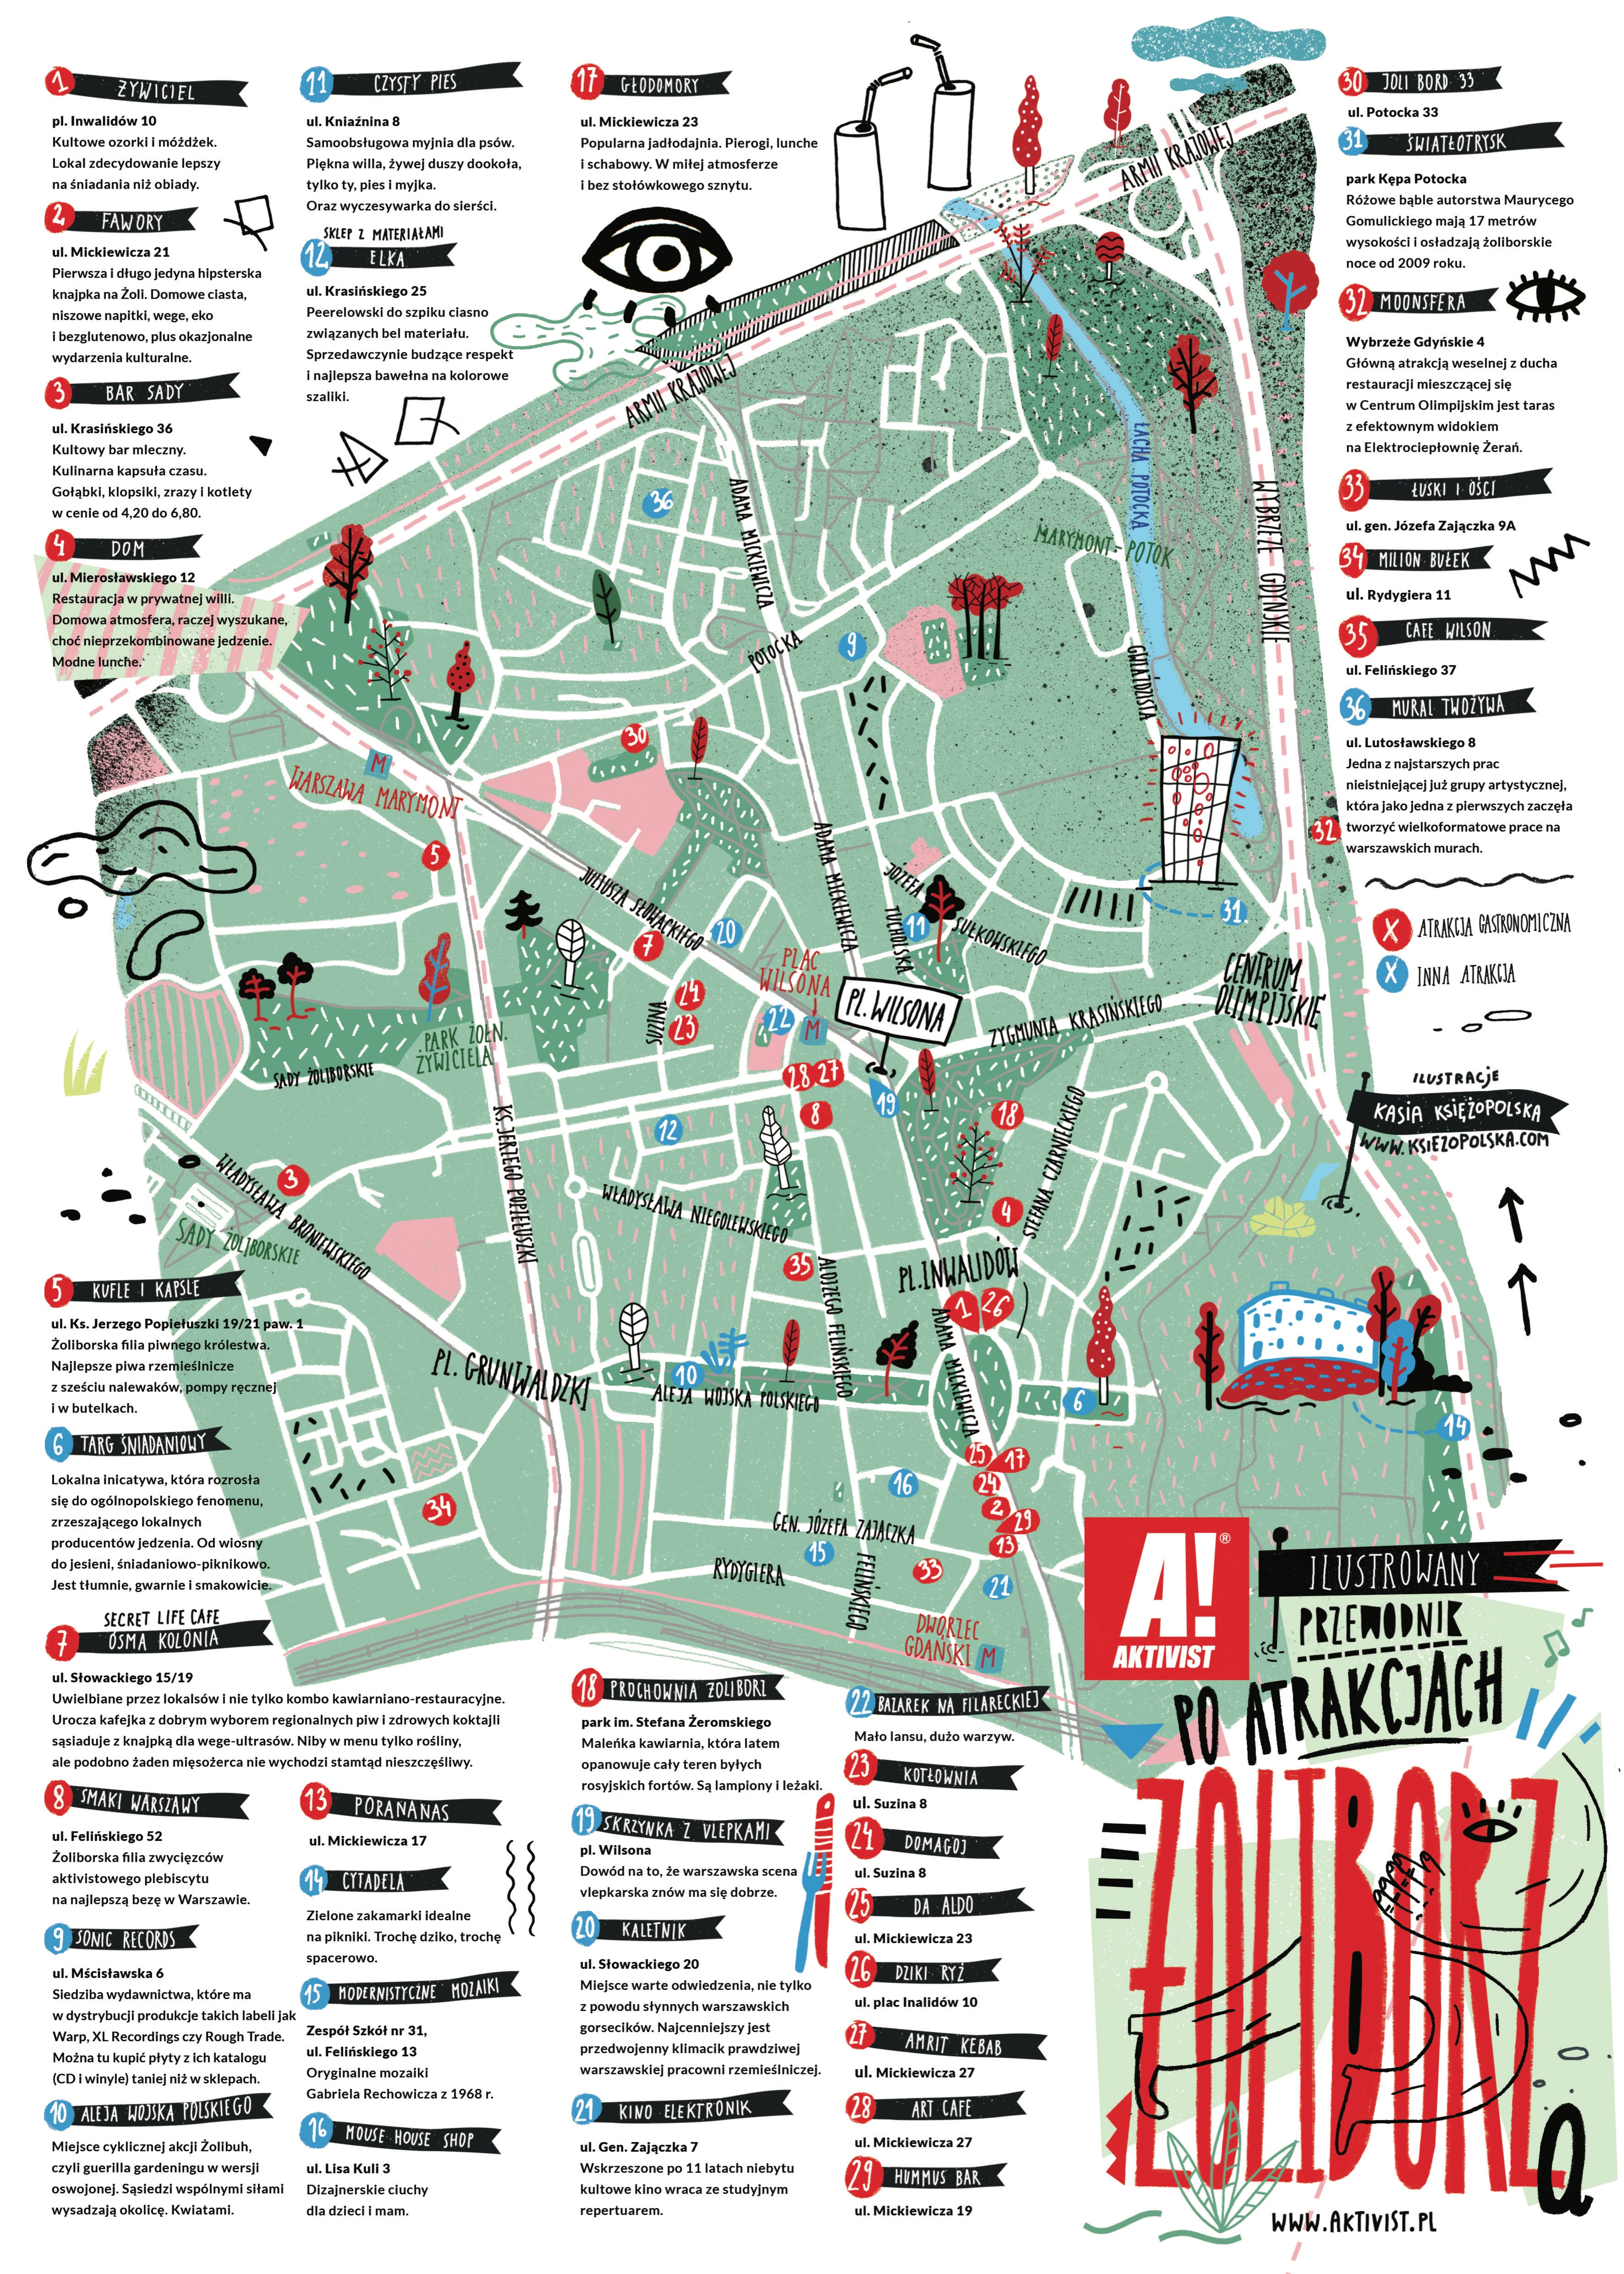 aktivist-mapa-zoliborz